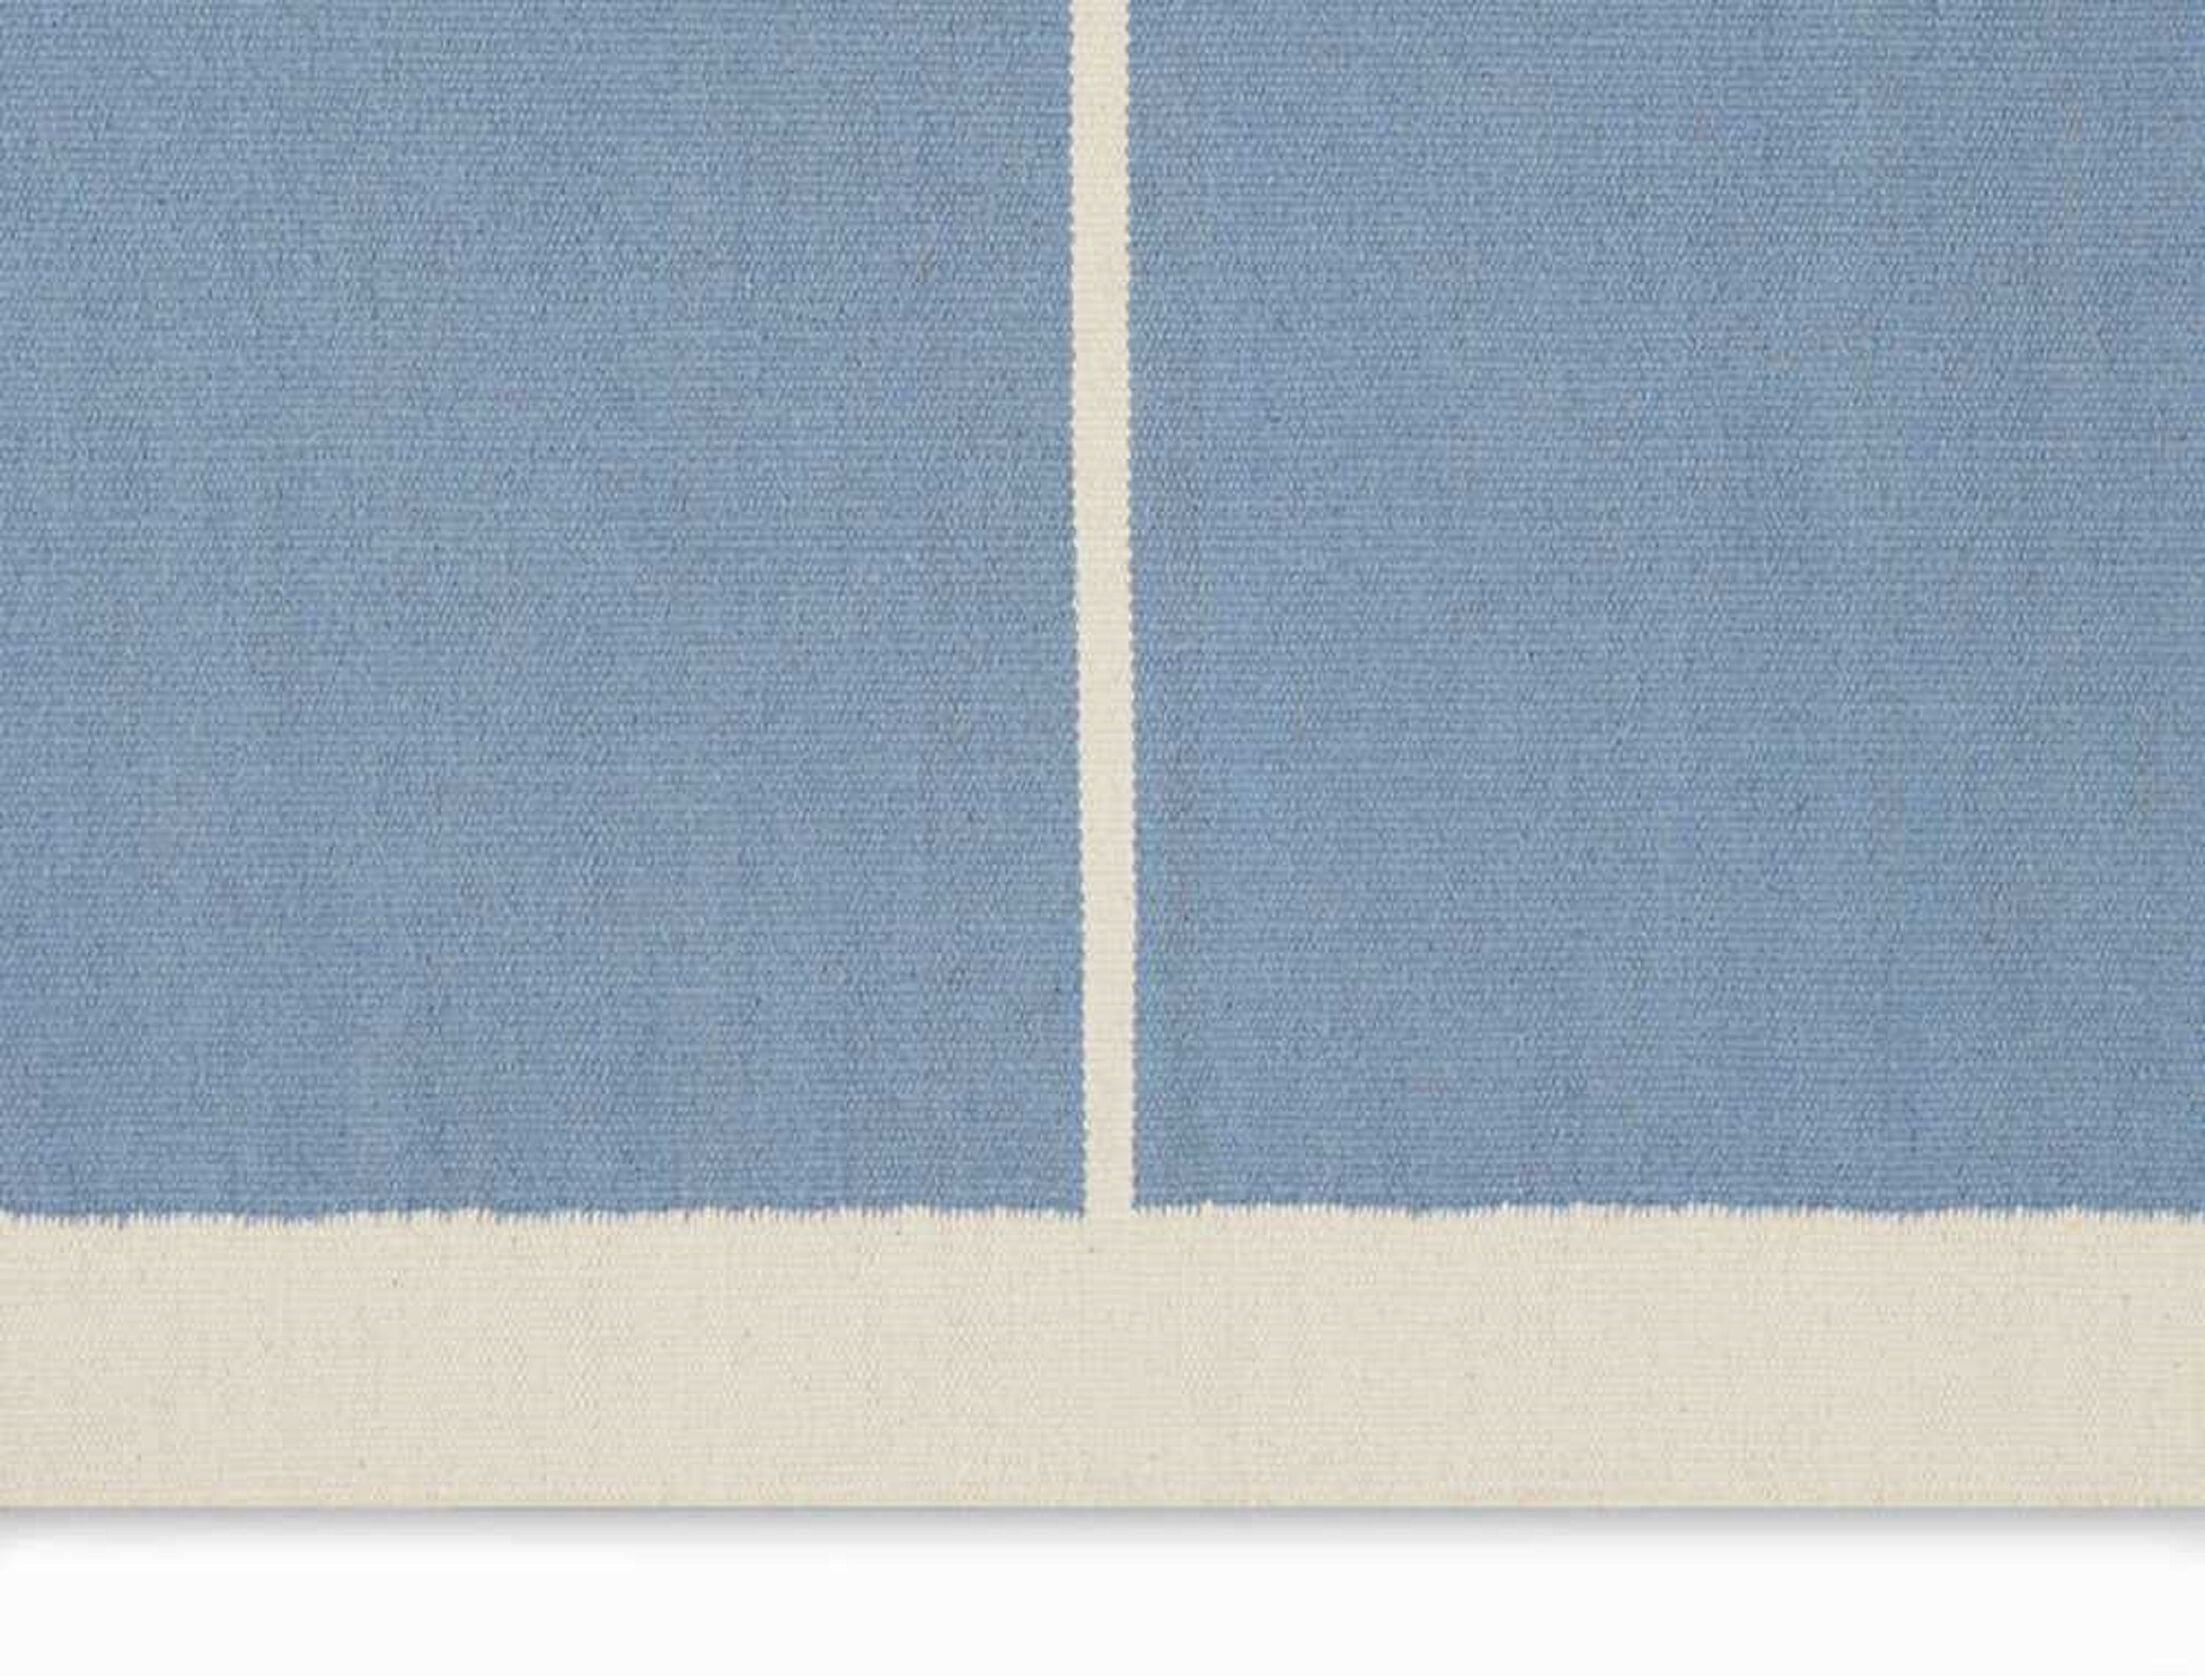 Nashville Modern Hand-Woven Light Blue/Ivory Area Rug Rug Size: Rectangle 4' x 6'